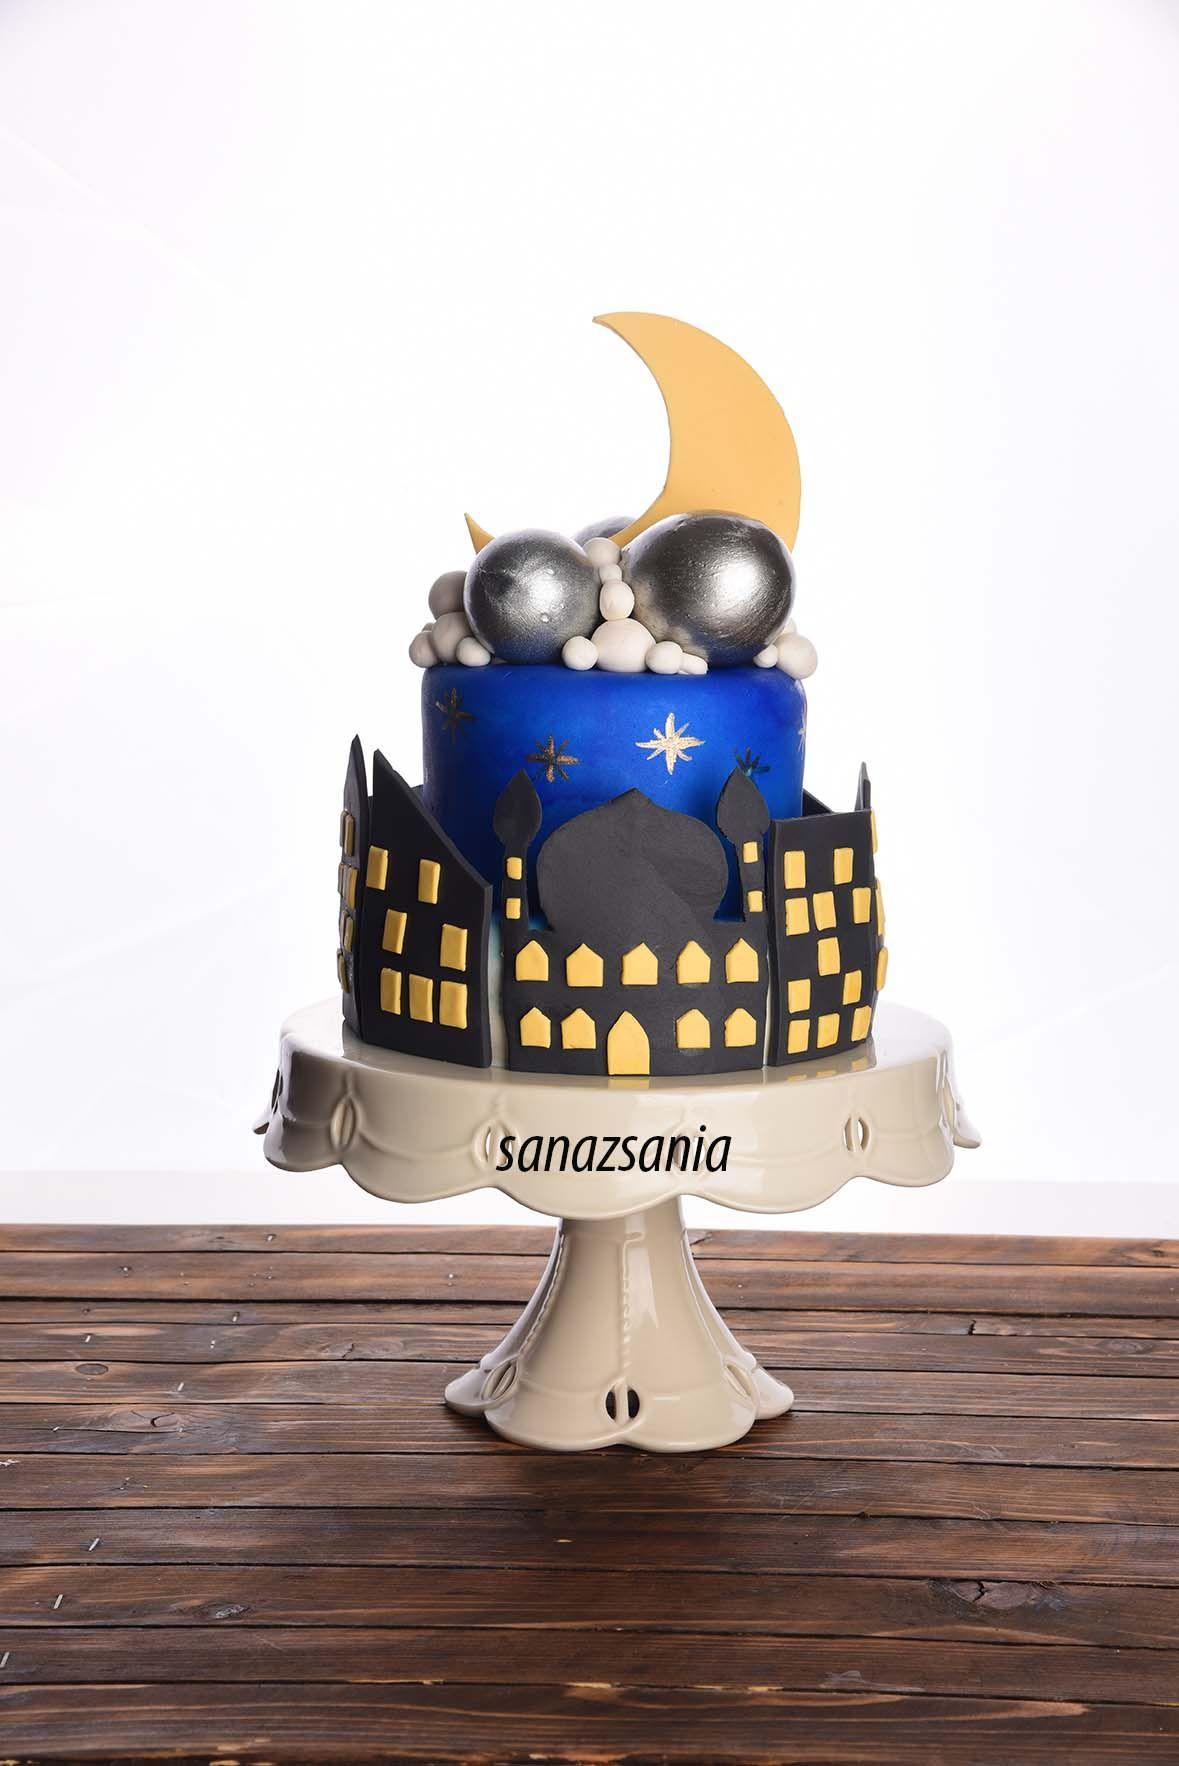 Wonderfull Cake For Ramadan کیک شهررمضان Eid Cake Ramadan Sweets Ramadan Desserts